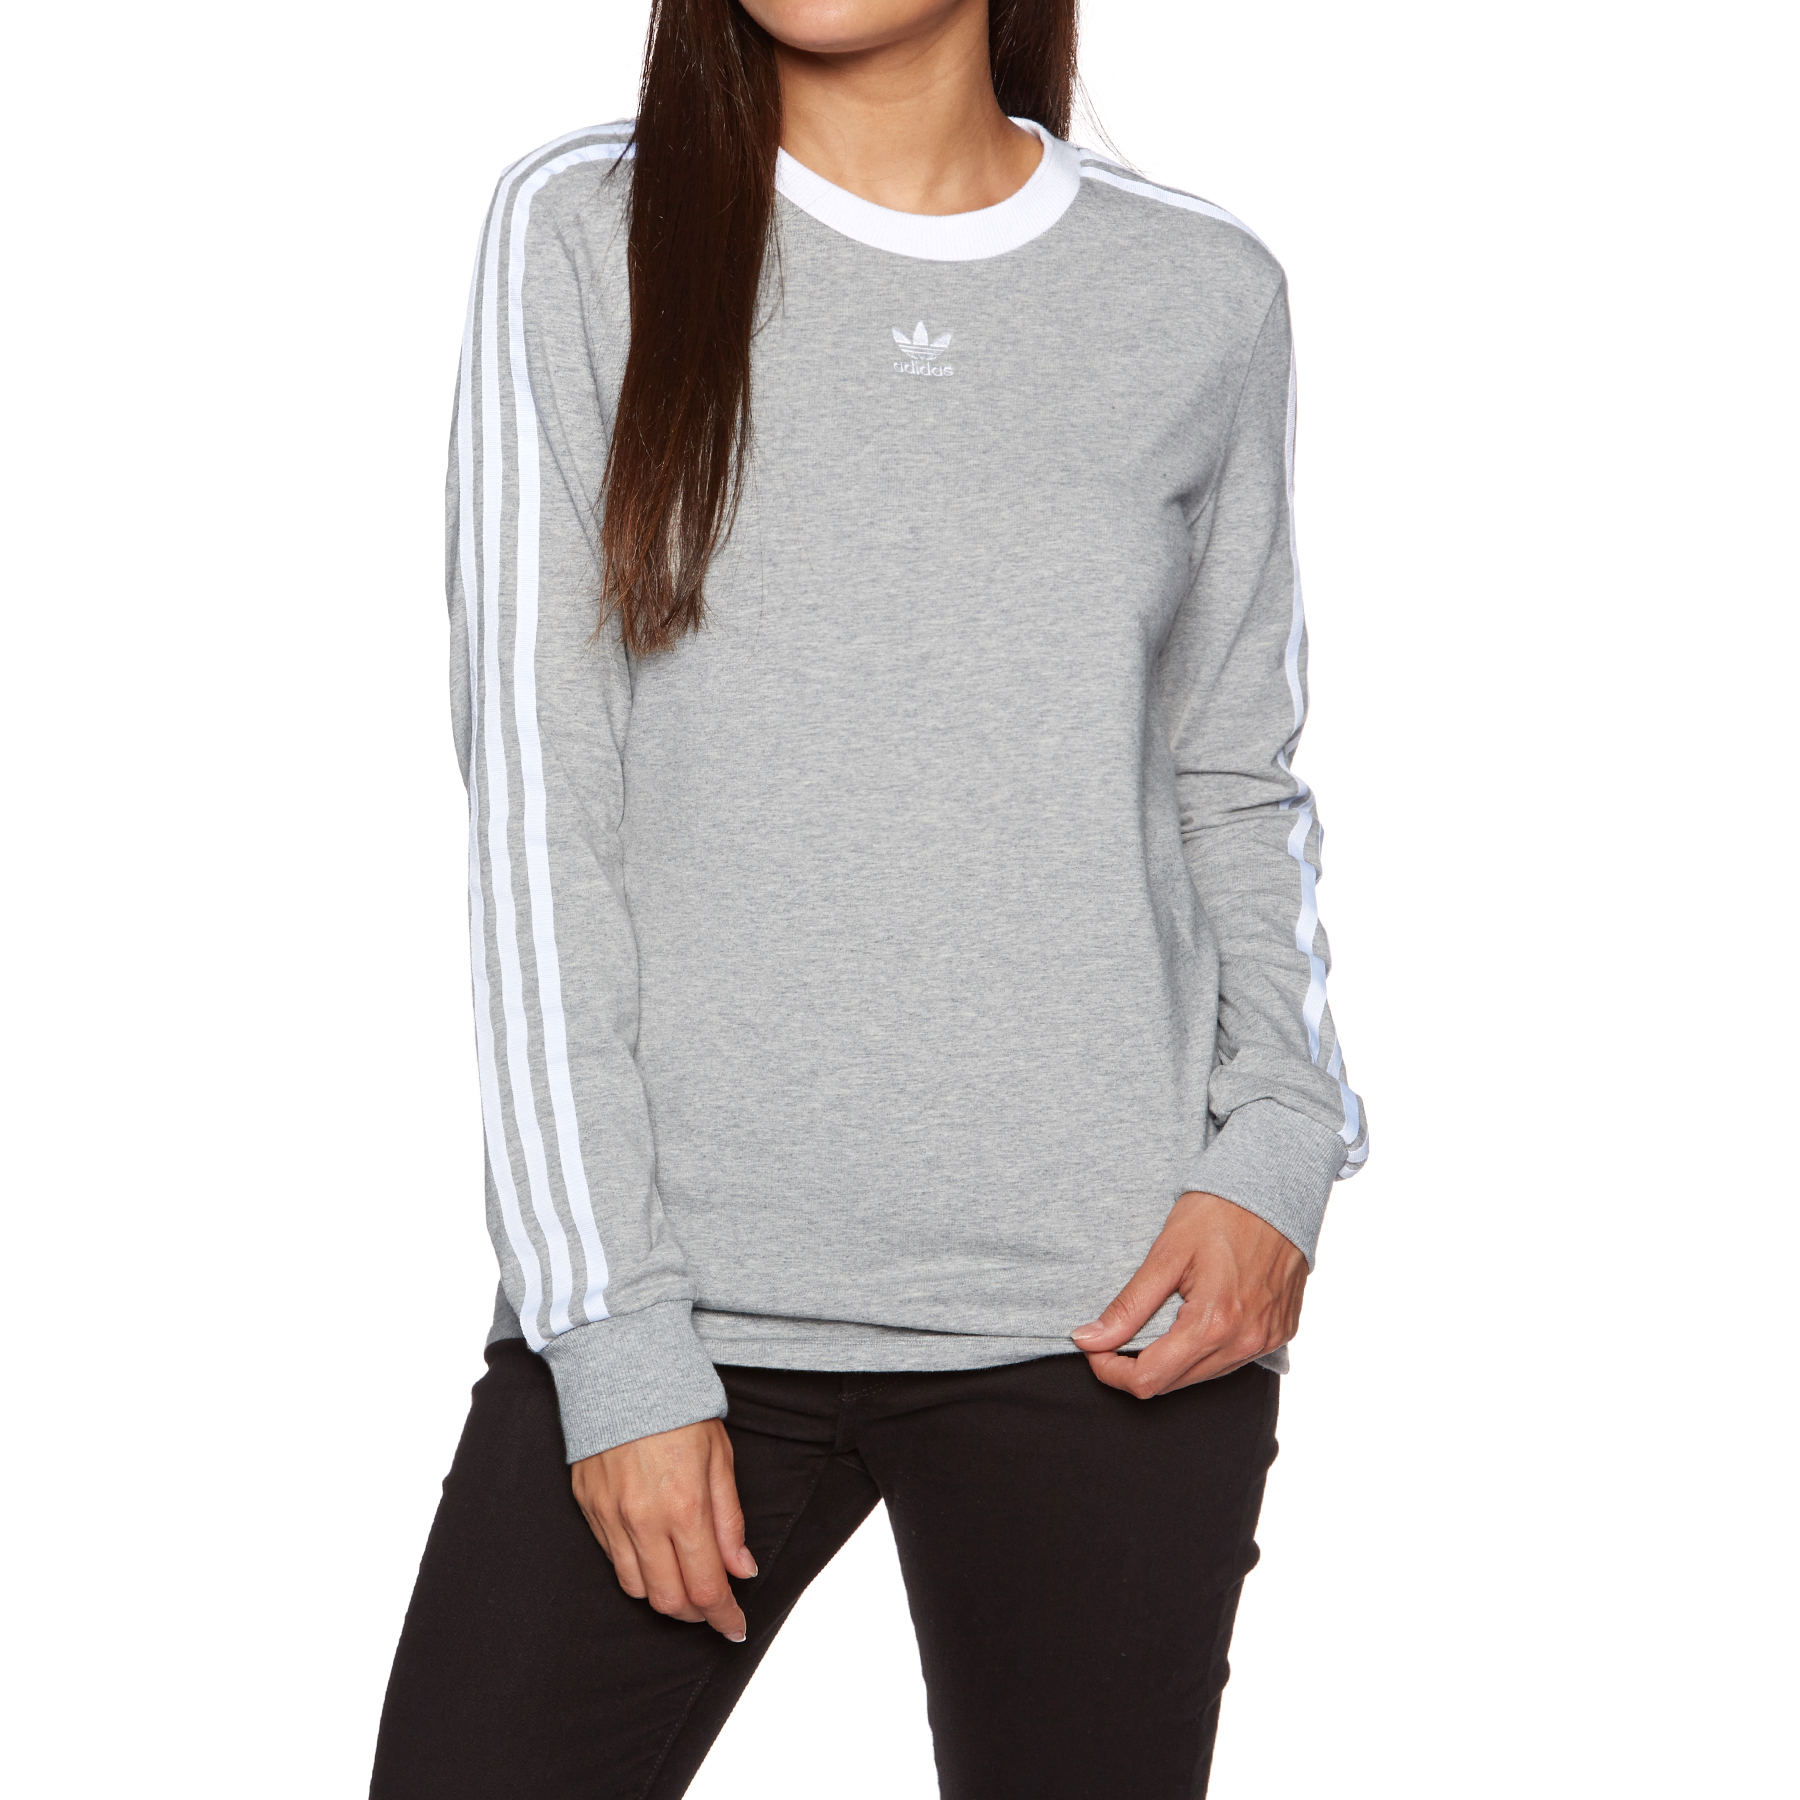 adidas 3 stripe sweatshirt womens